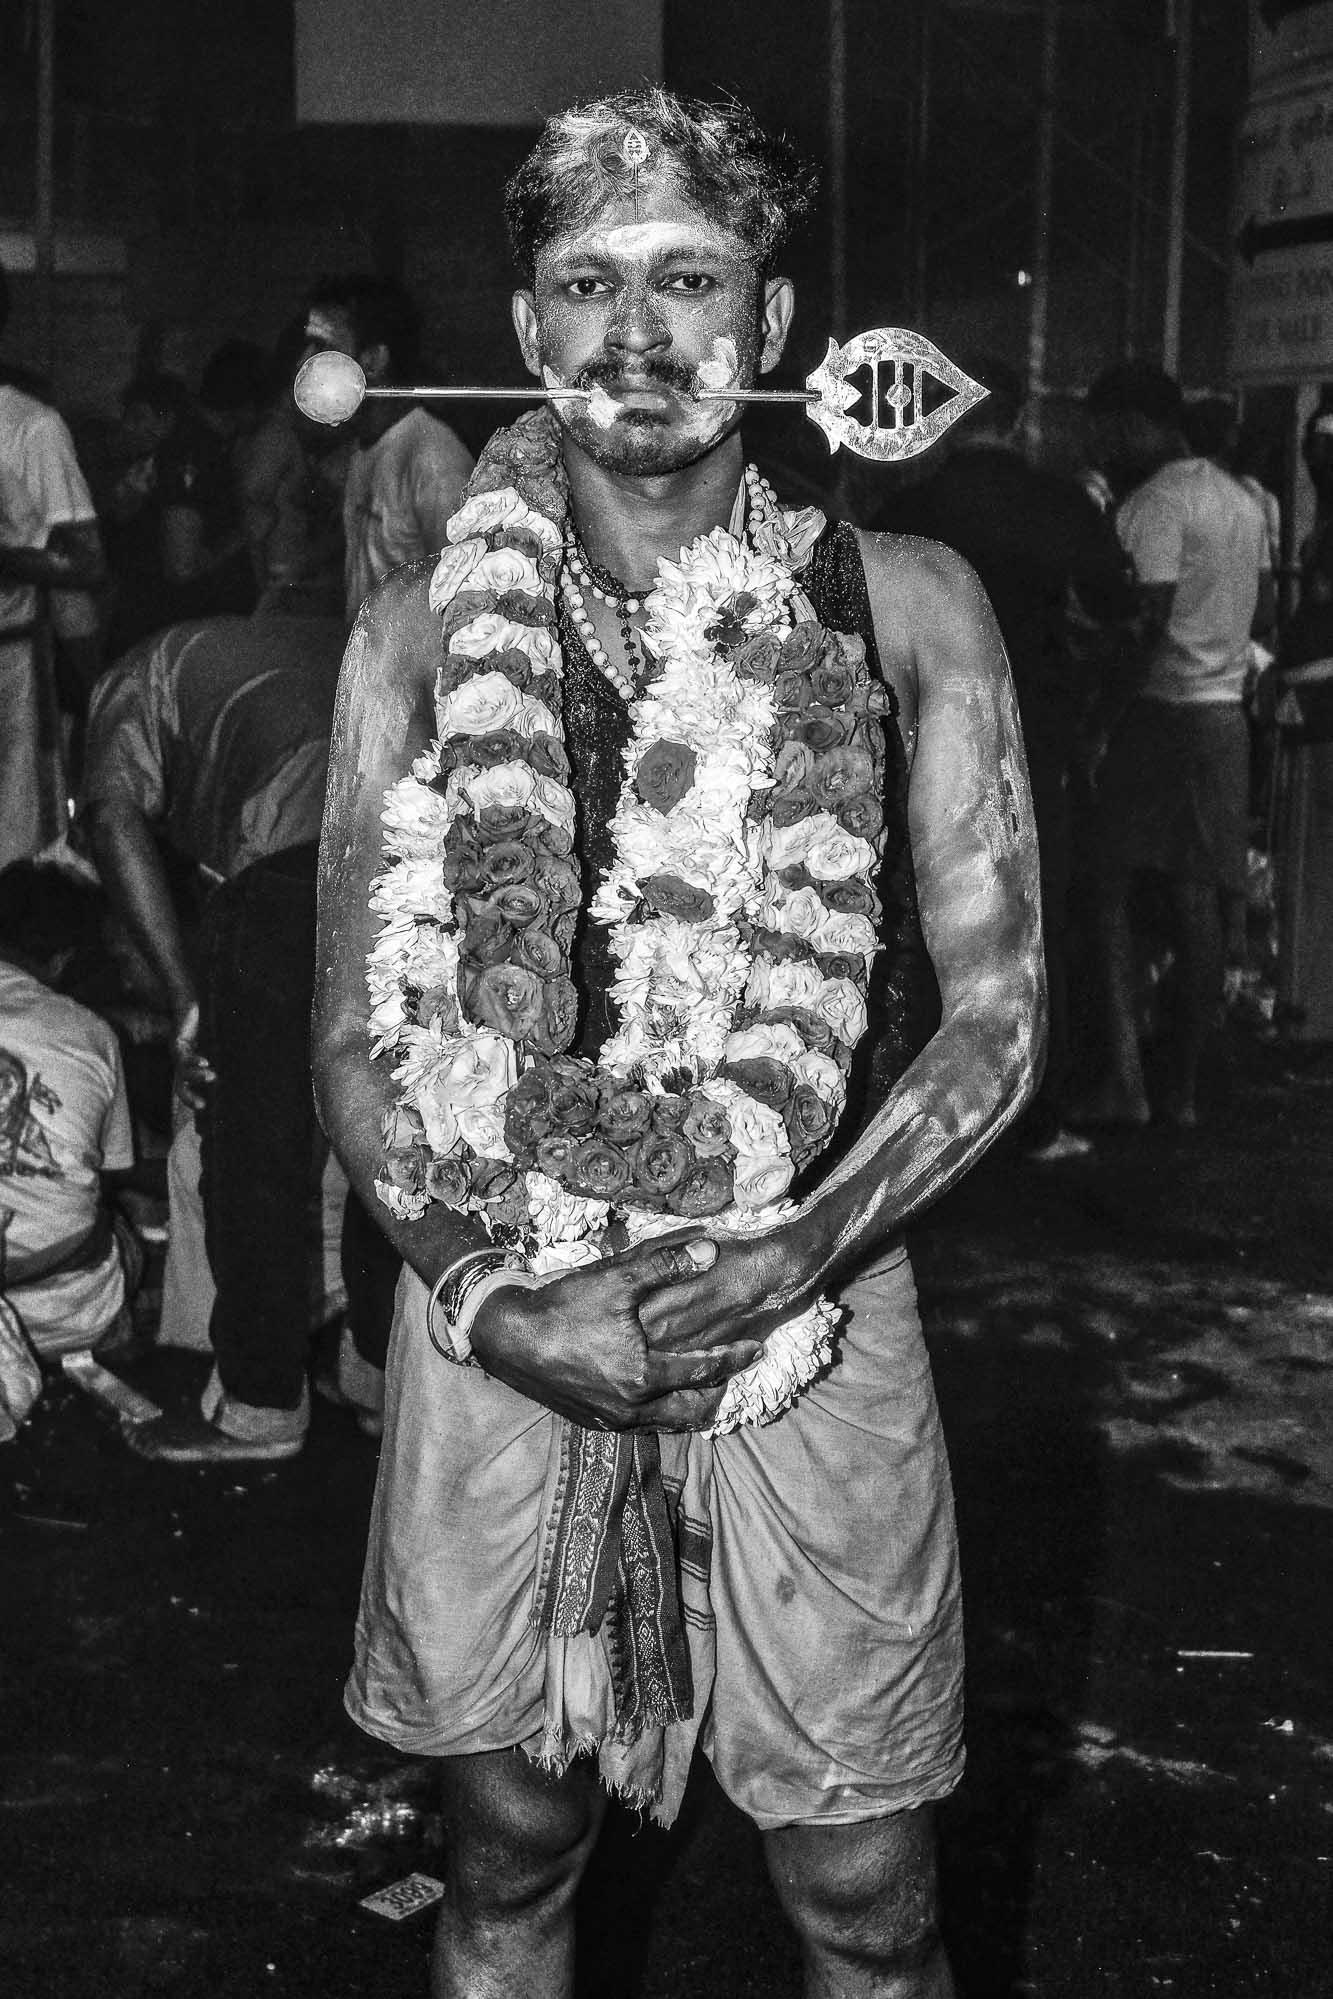 piercing indian man temple Little India Thaipusam Festival hindu Singapore photography jose jeuland documentary event